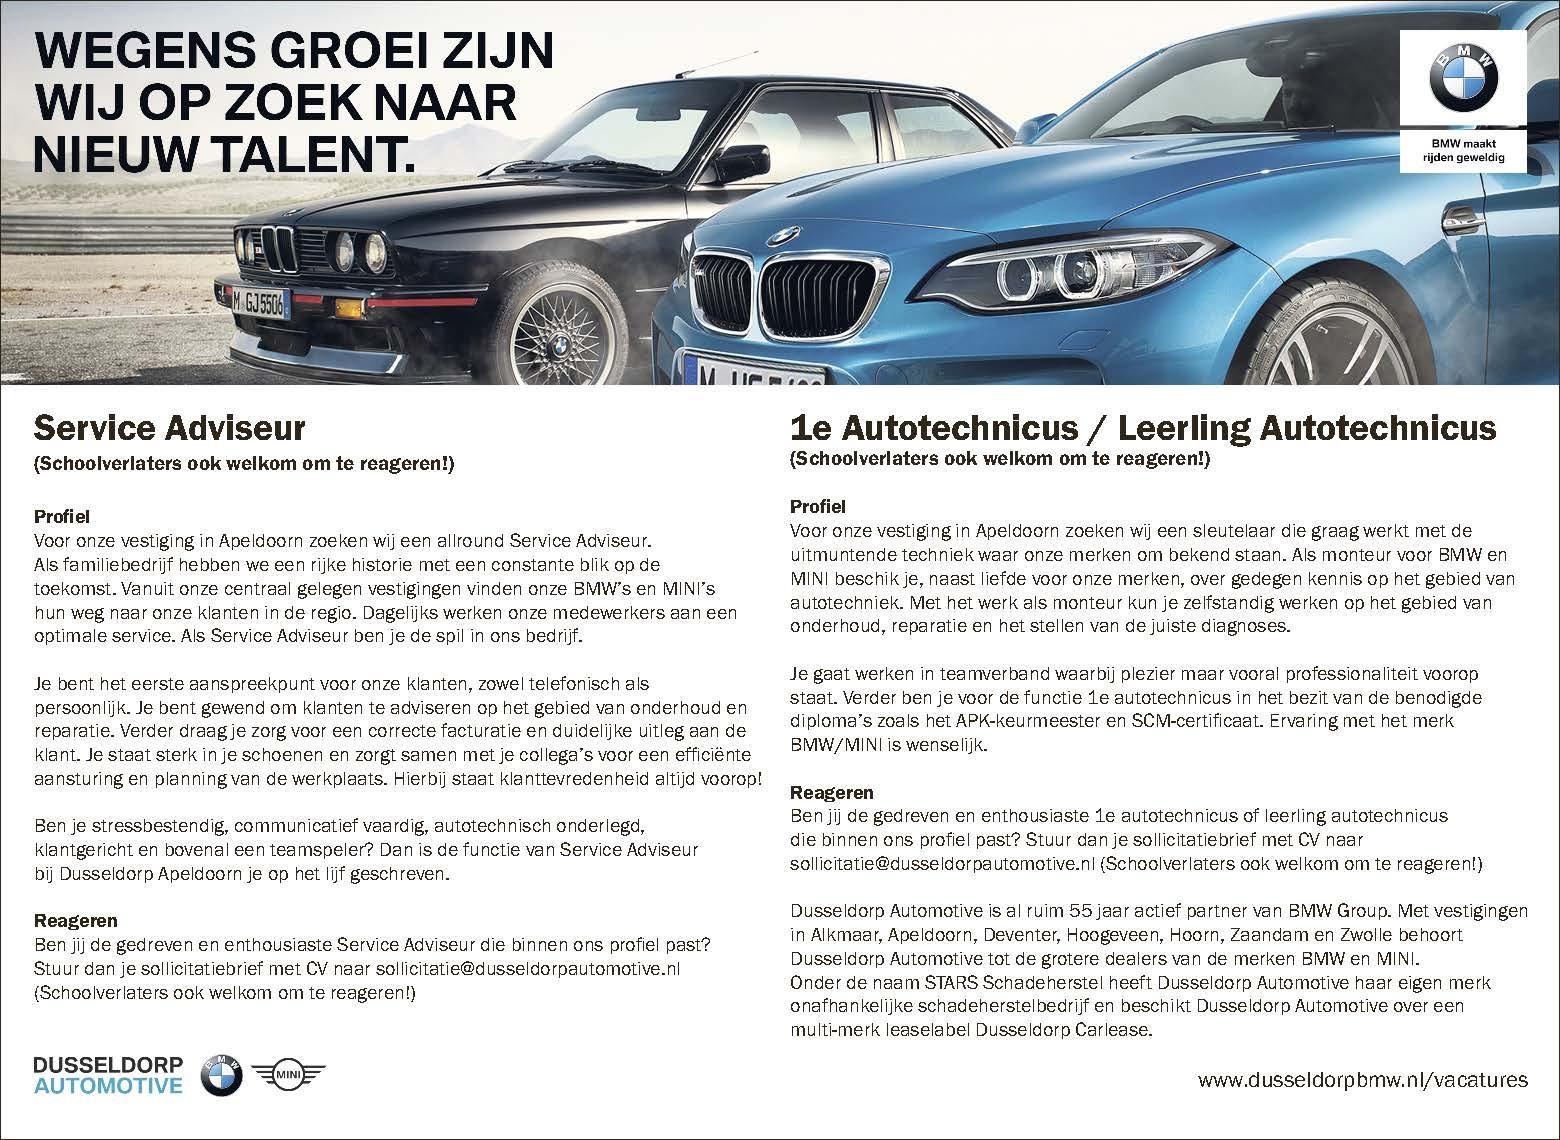 Service Adviseur / 1e Autotechnicus / Leerling Autotechnicus